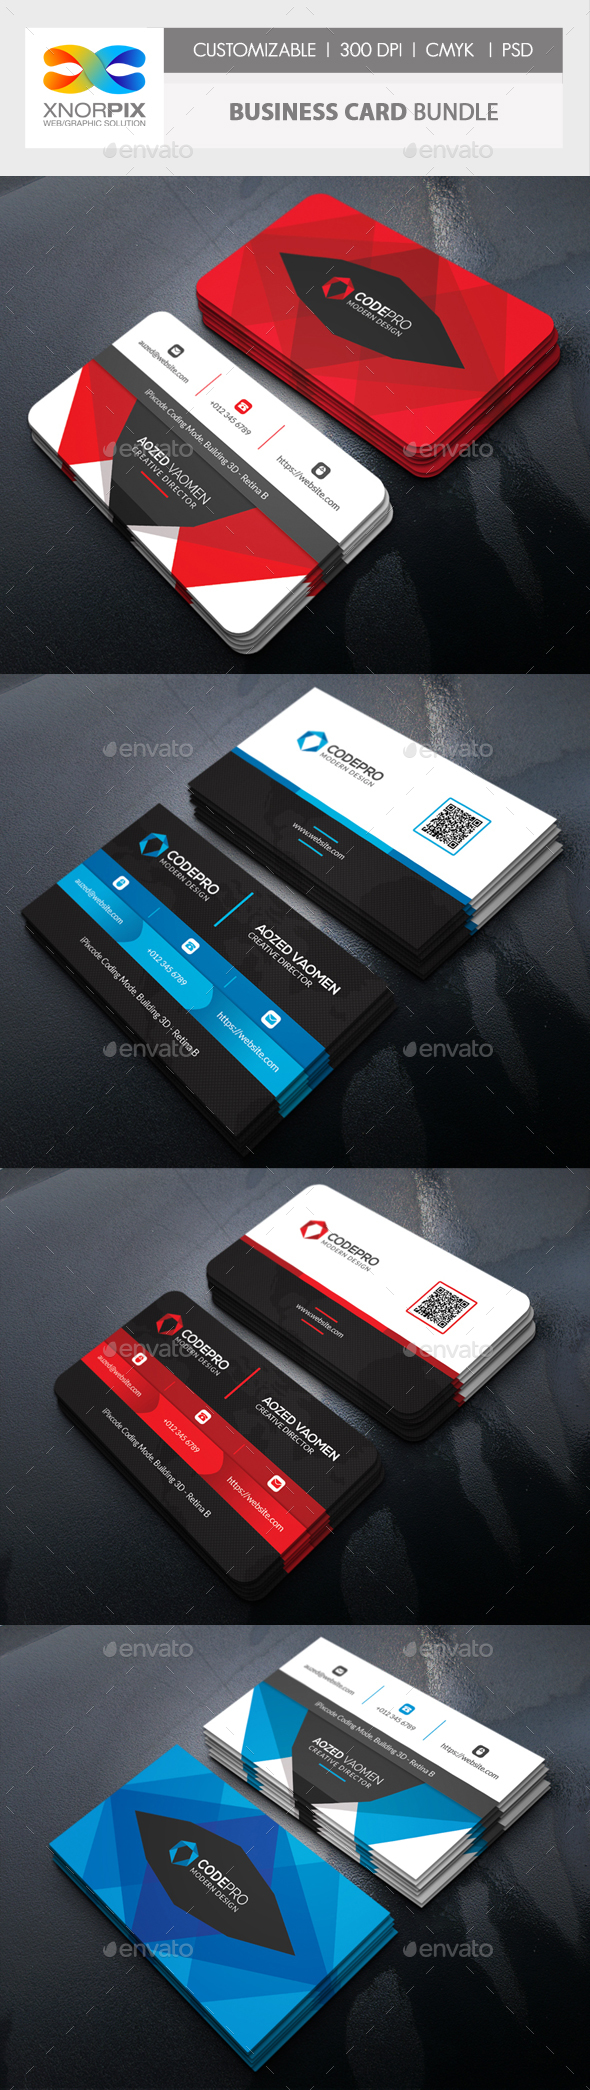 Business Card Bundle - Corporate Business Cards